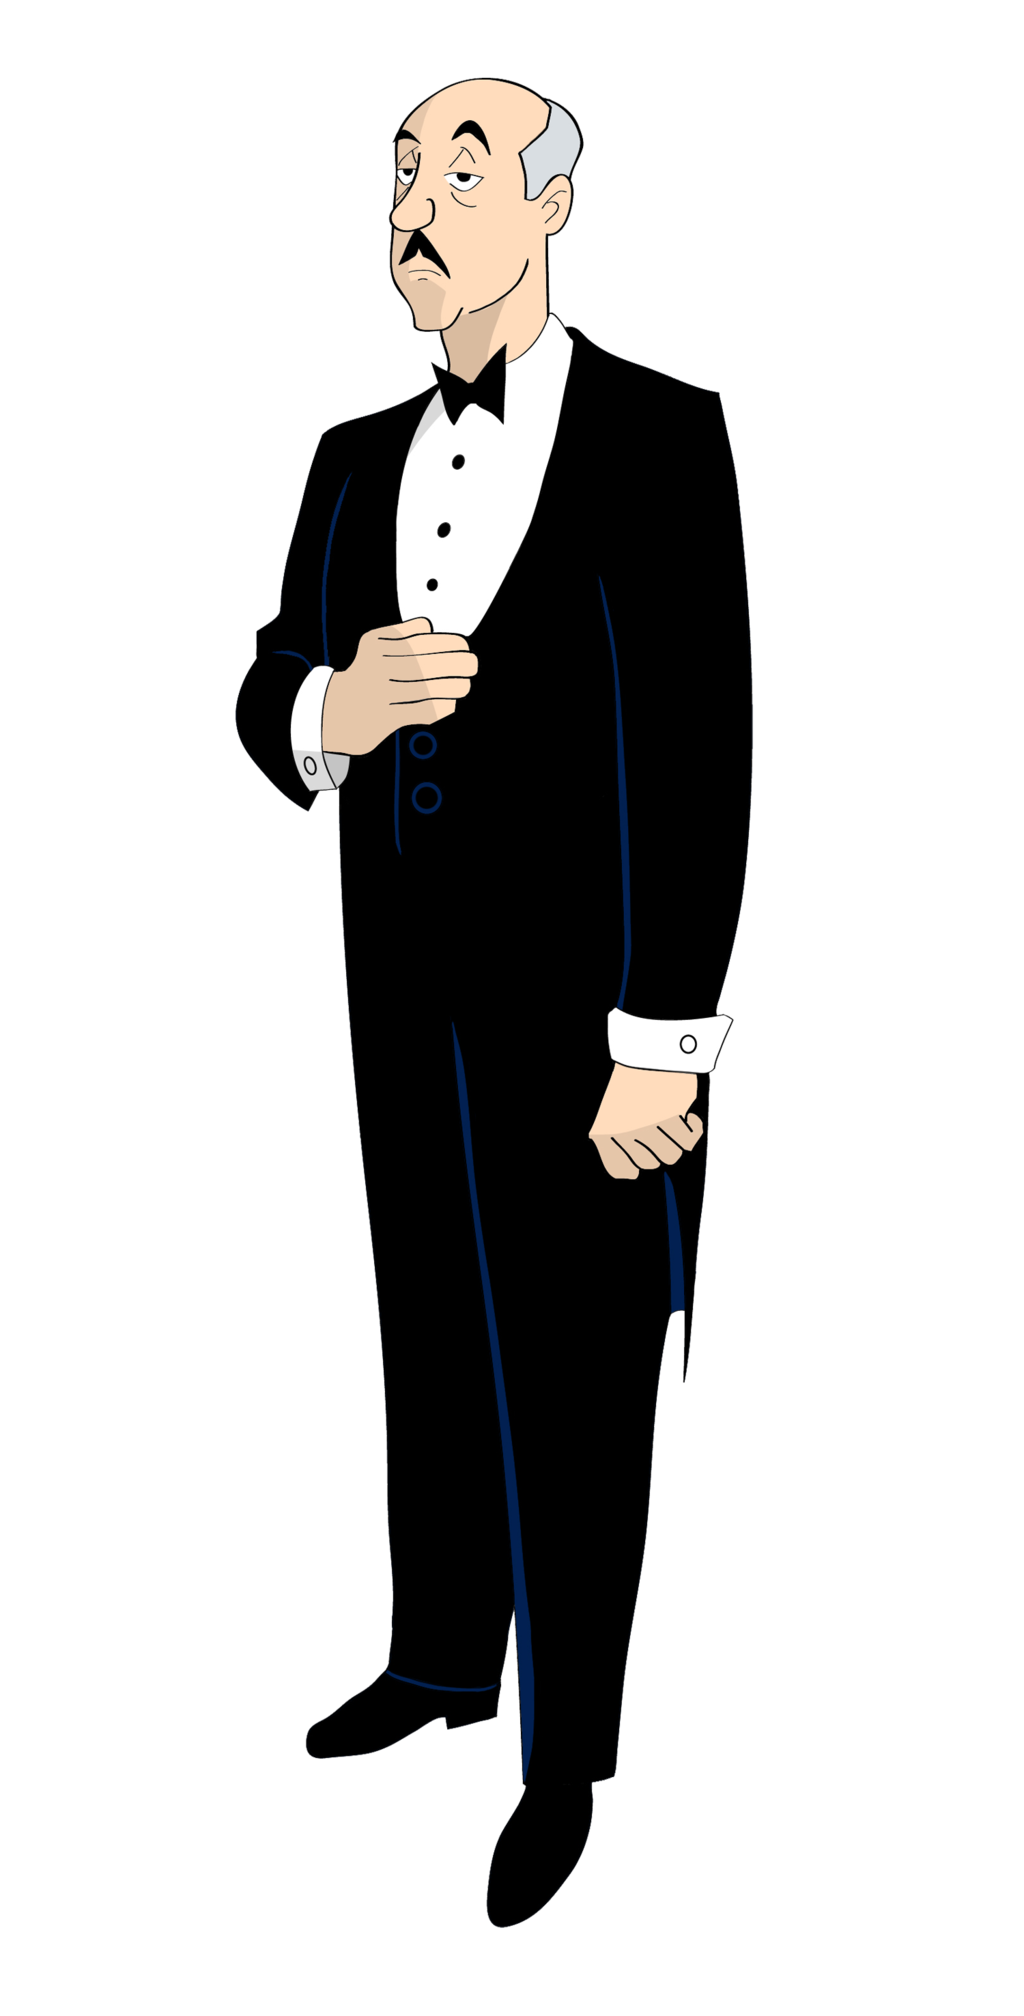 Alfred Pennyworth by DawidARTe.deviantart.com on @DeviantArt.